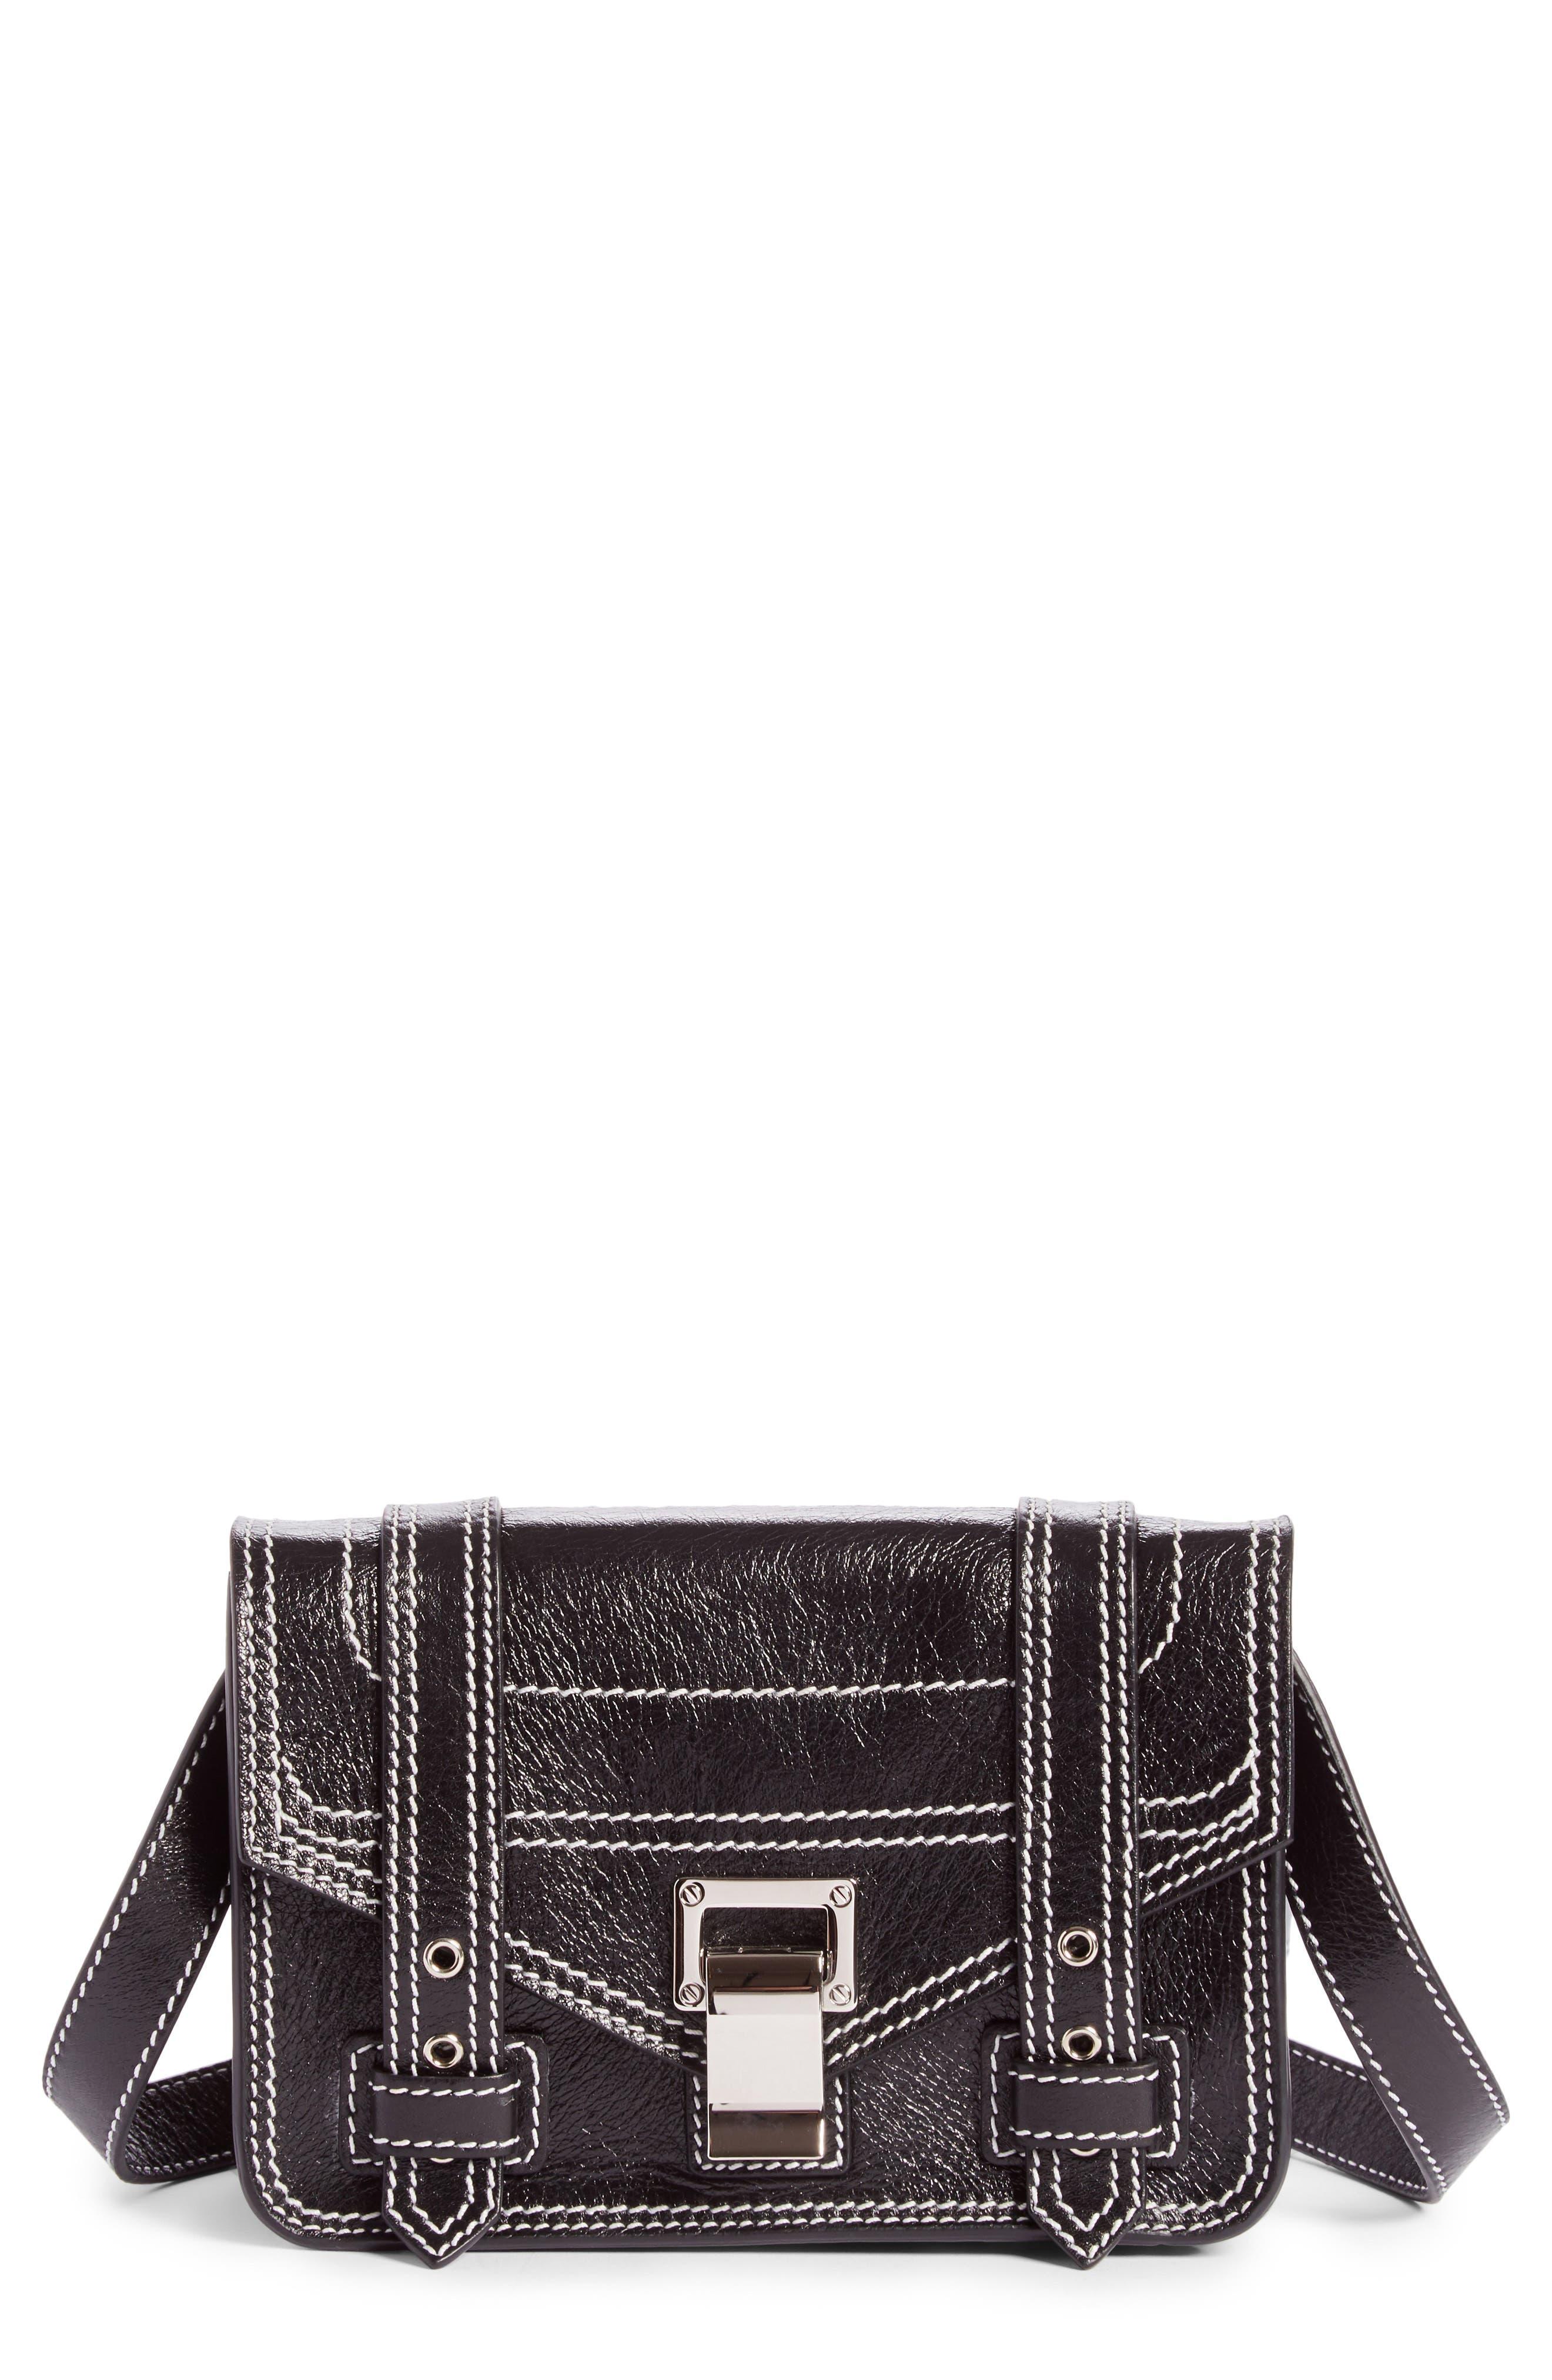 Main Image - Proenza Schouler Mini PS1 Leather Crossbody Bag